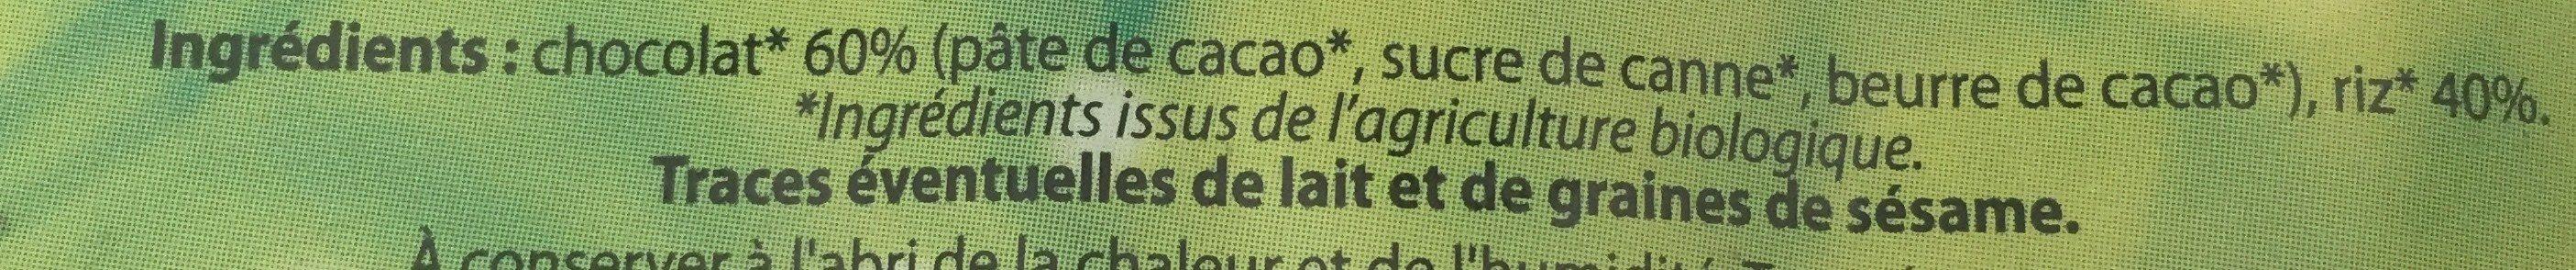 Galettes de Riz au chocolat - Ingredients - fr